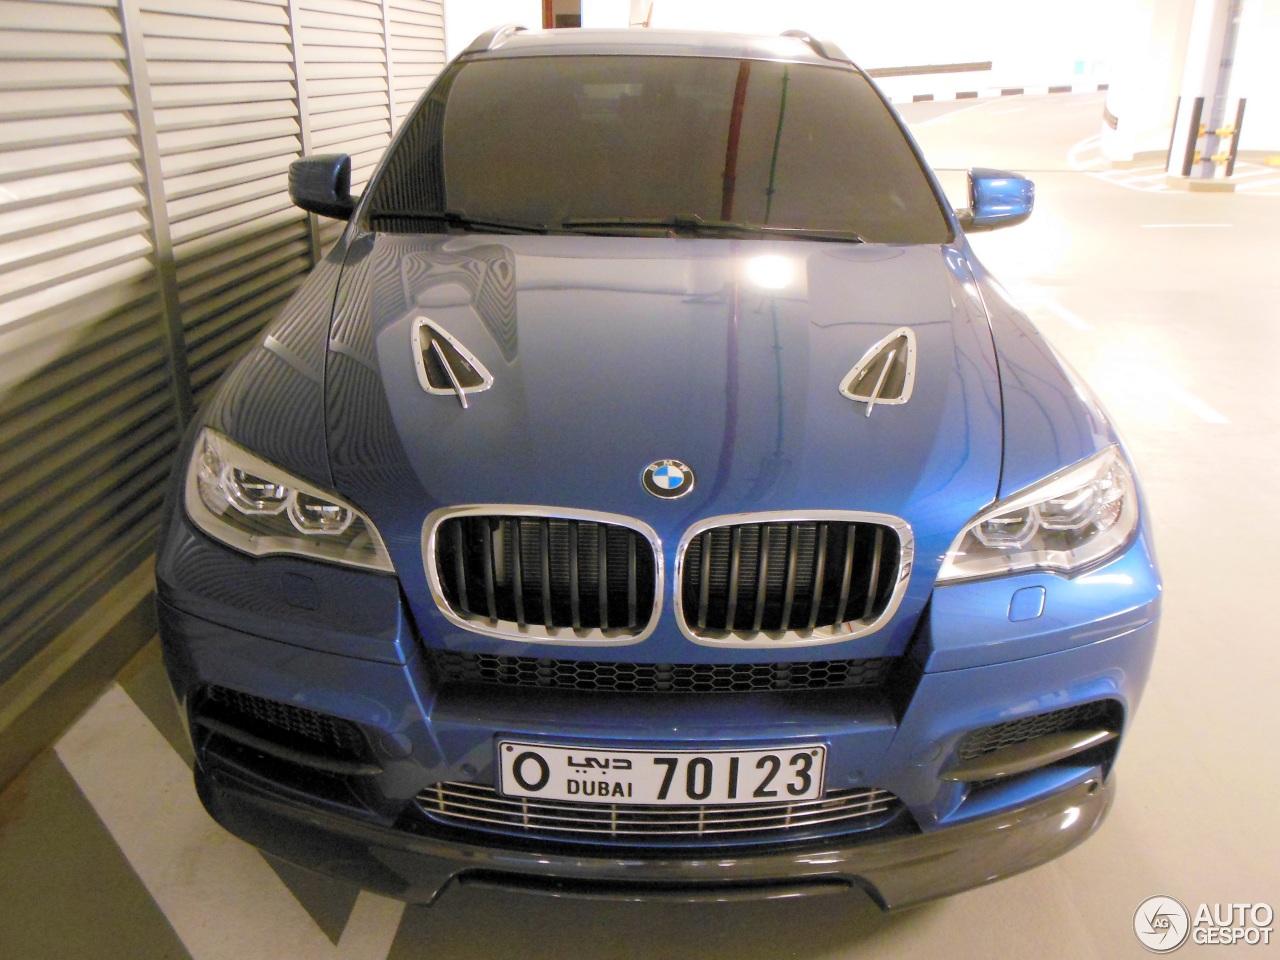 Bmw ac schnitzer x6 m 22 june 2015 autogespot 5 i bmw ac schnitzer x6 m 5 vanachro Gallery